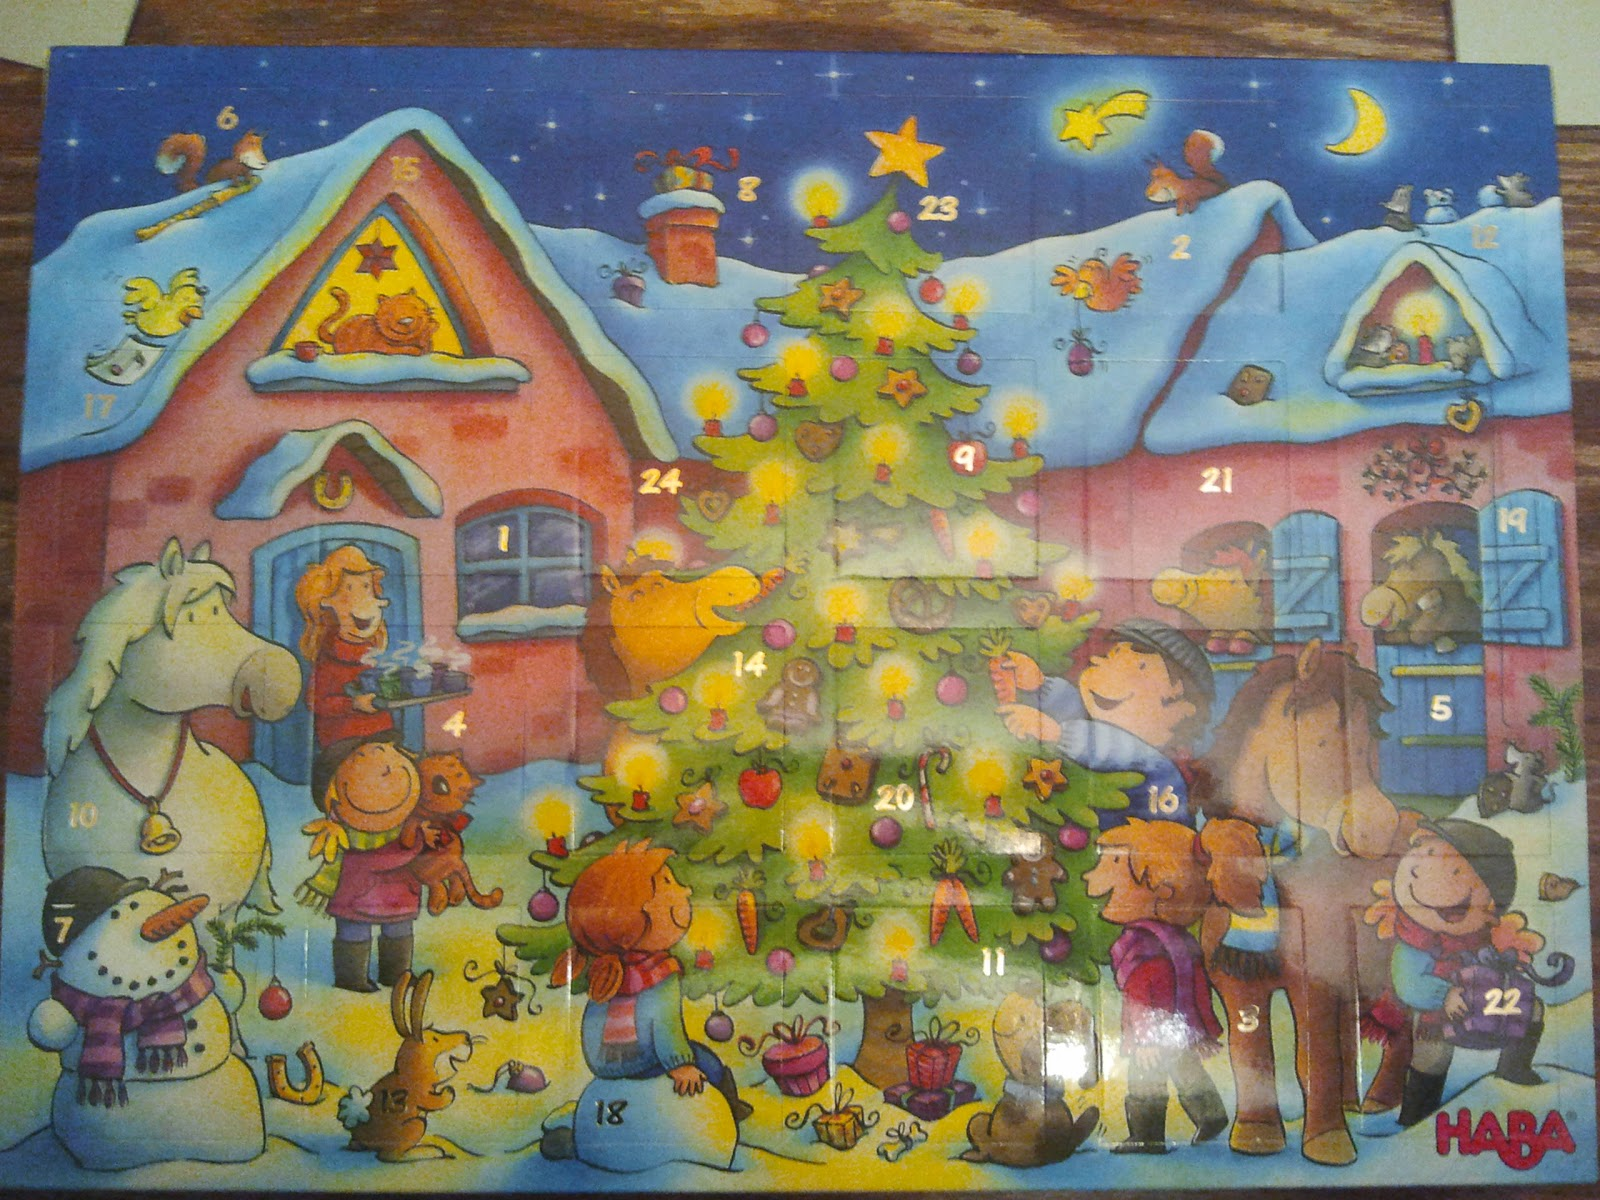 Squeaky Baby HABA Ratz Fatz Adventskalender Ponyhof Review